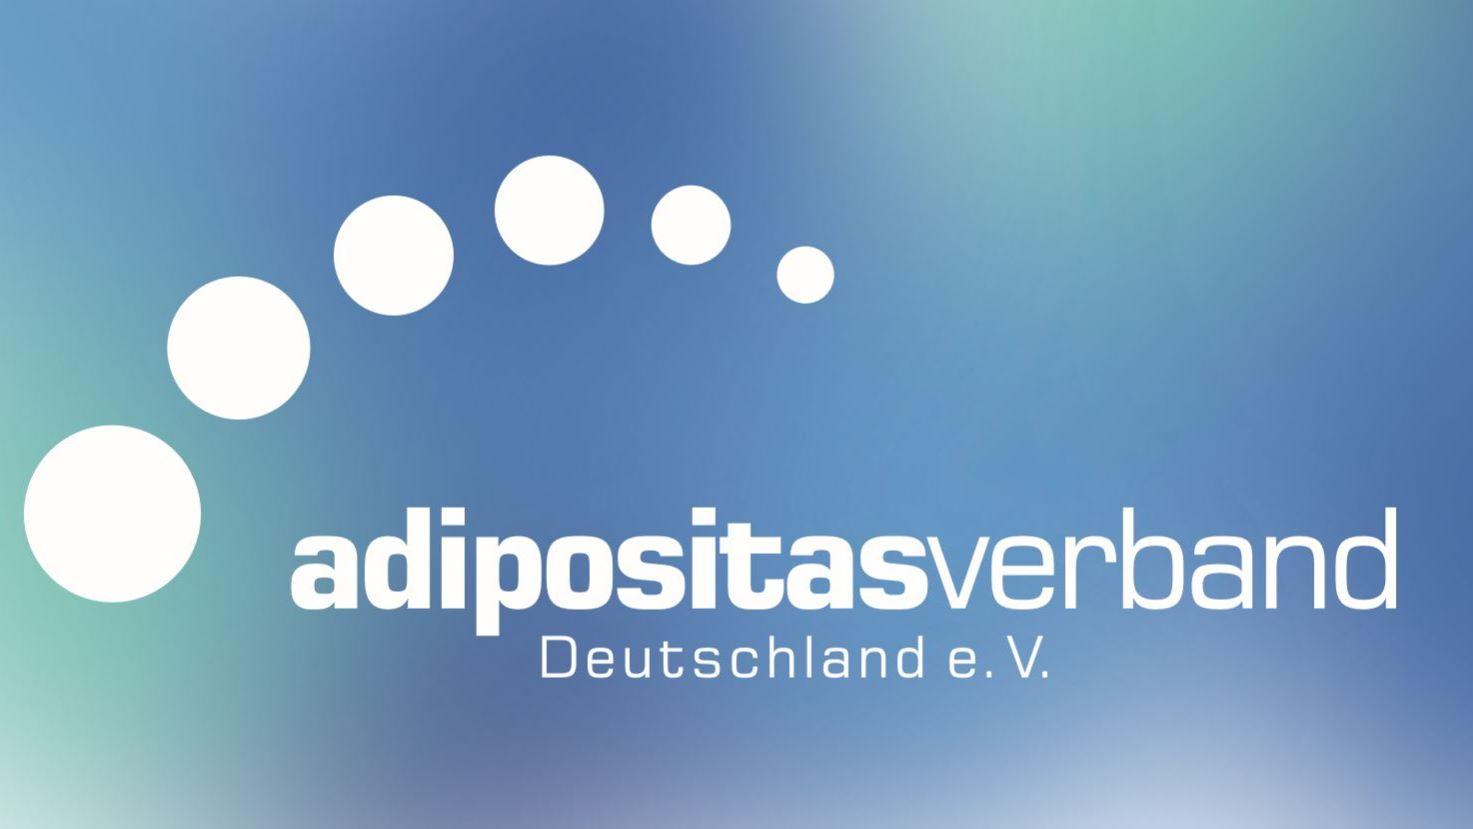 Adipositas Verband Deutschland